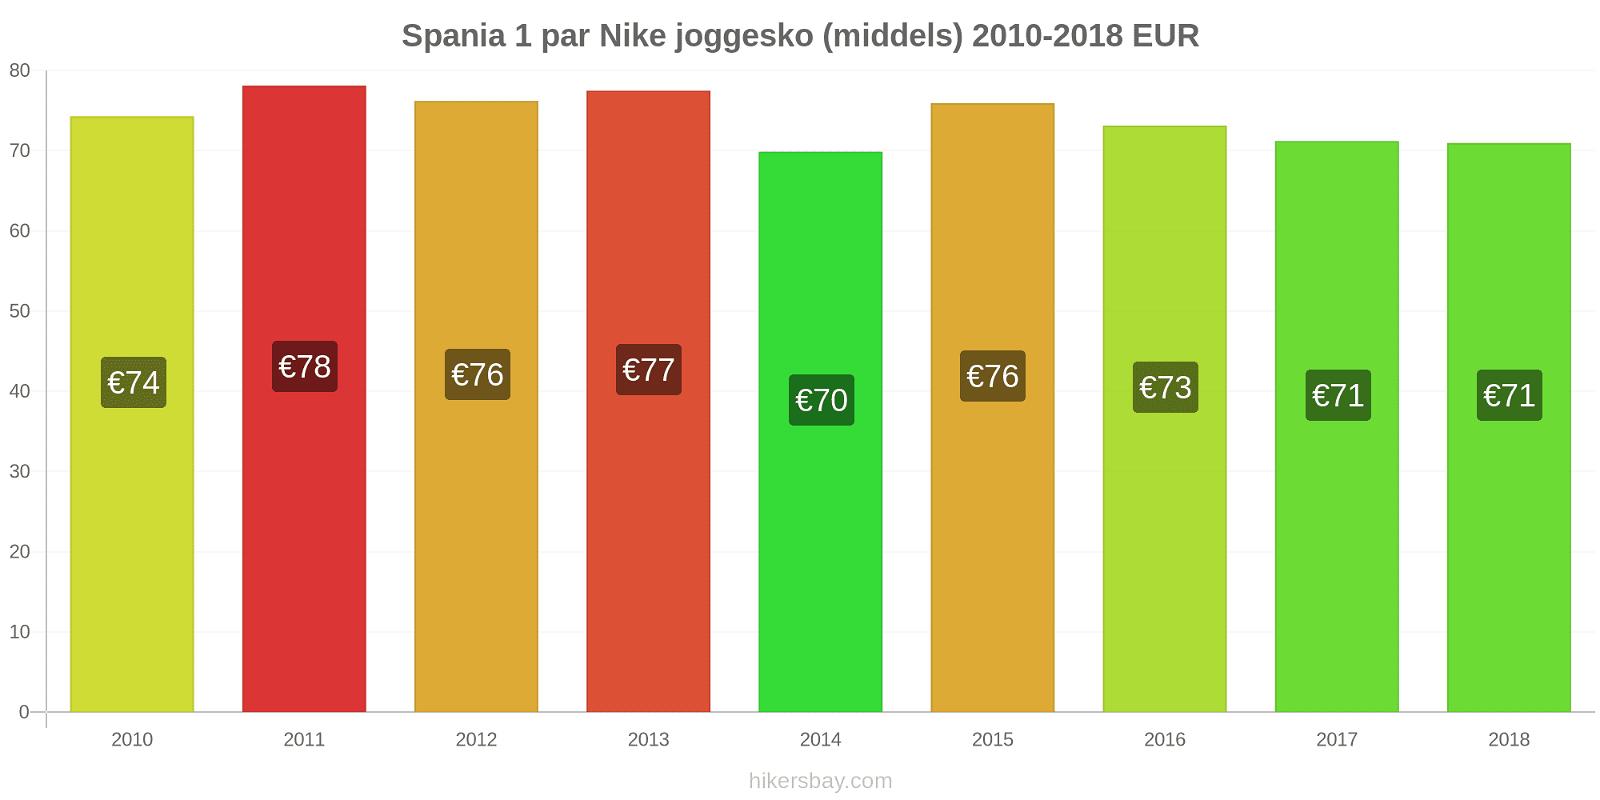 Spania prisendringer 1 par Nike joggesko (middels) hikersbay.com